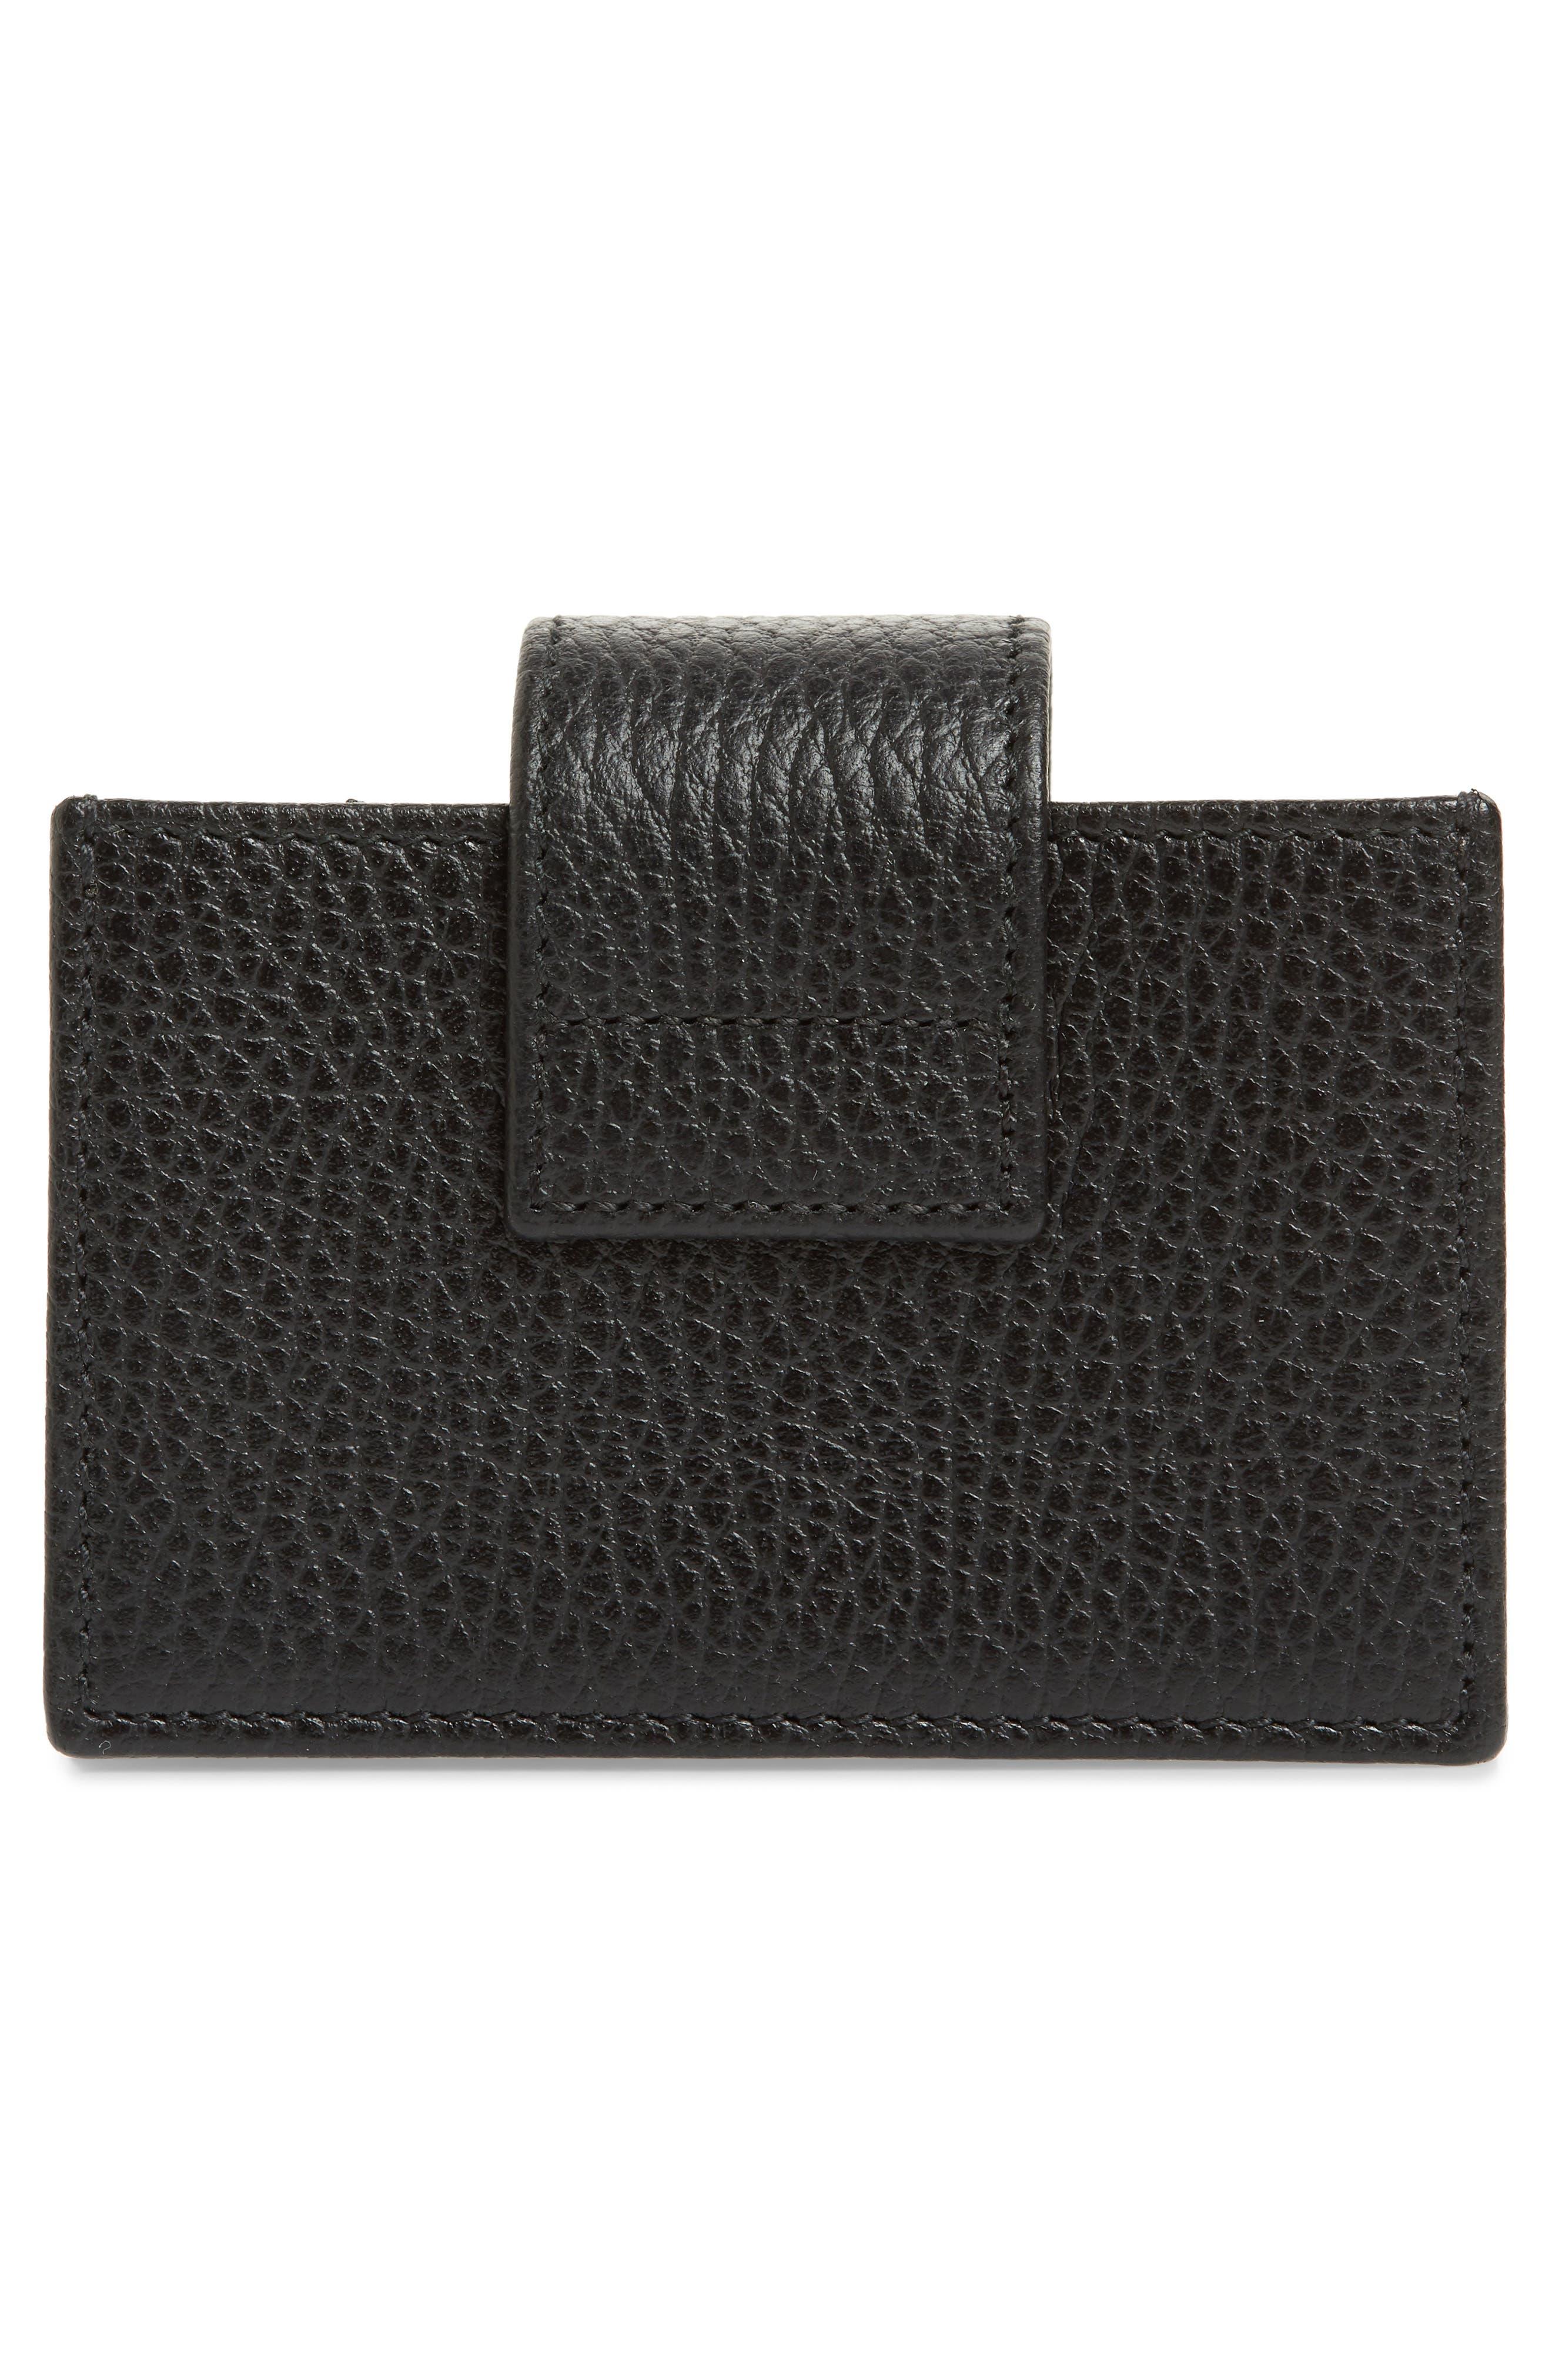 Petite Marmont Leather Card Case,                             Alternate thumbnail 3, color,                             NERO